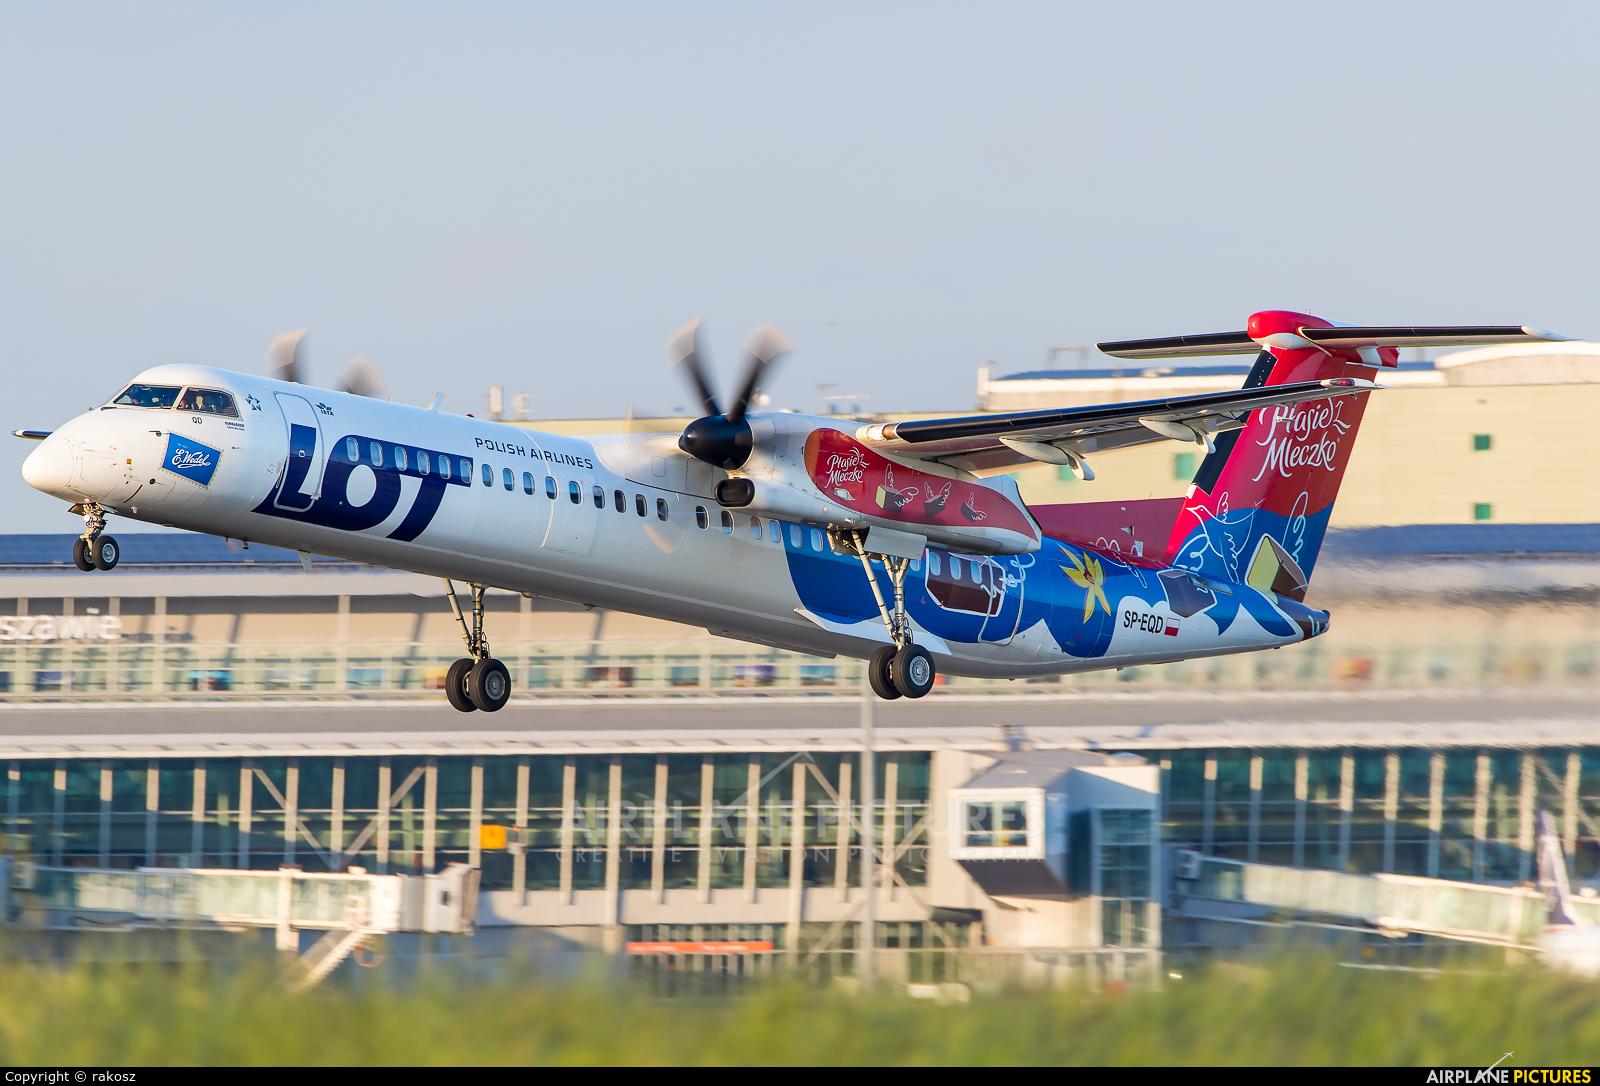 LOT - Polish Airlines SP-EQD aircraft at Warsaw - Frederic Chopin